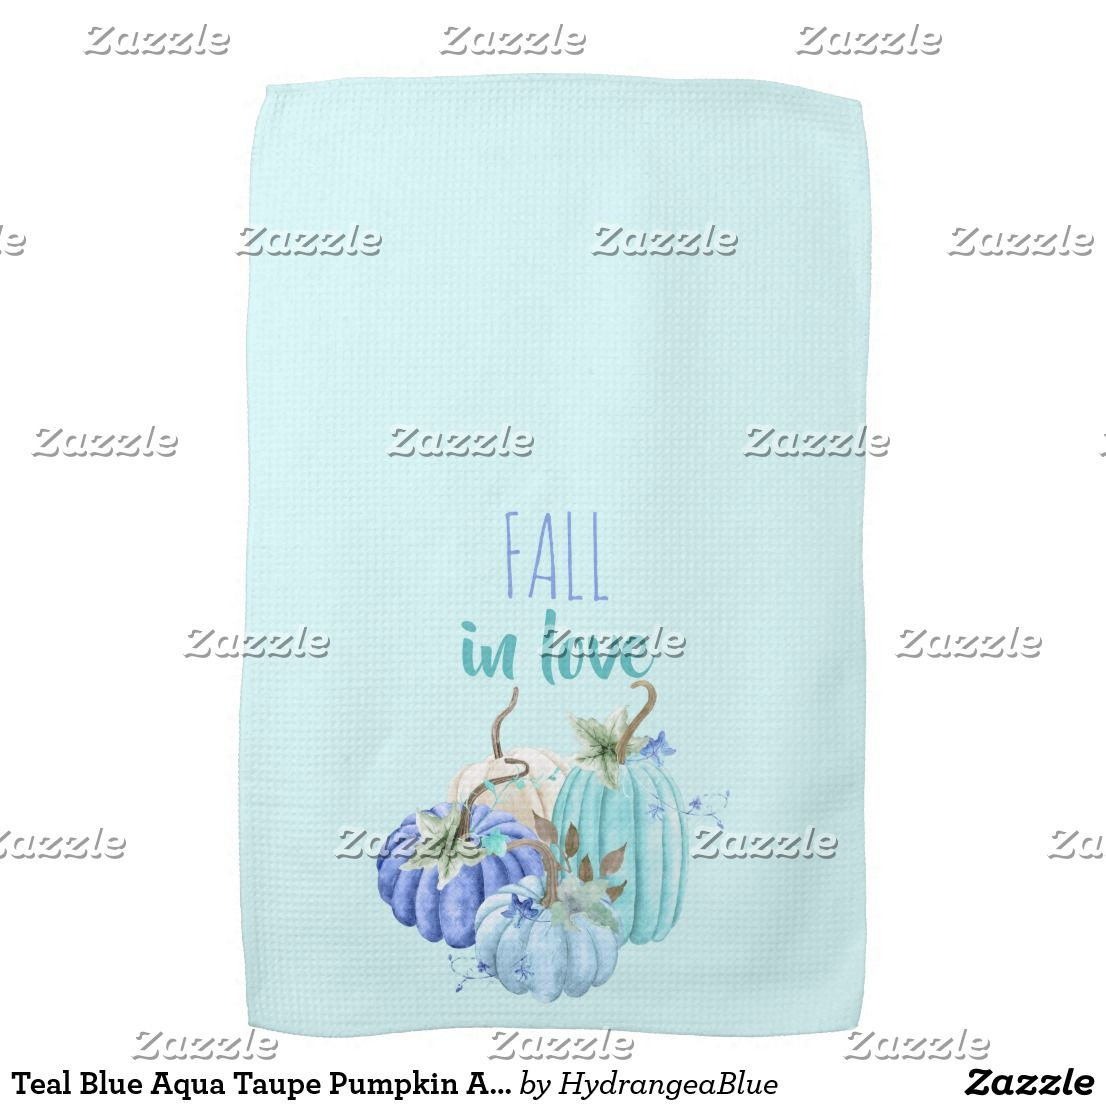 Teal Blue Aqua Taupe Pumpkin Autumn Fall Hand Towel    Teal Blue Aqua Taupe Pumpkin Autumn Fall Hand Towel